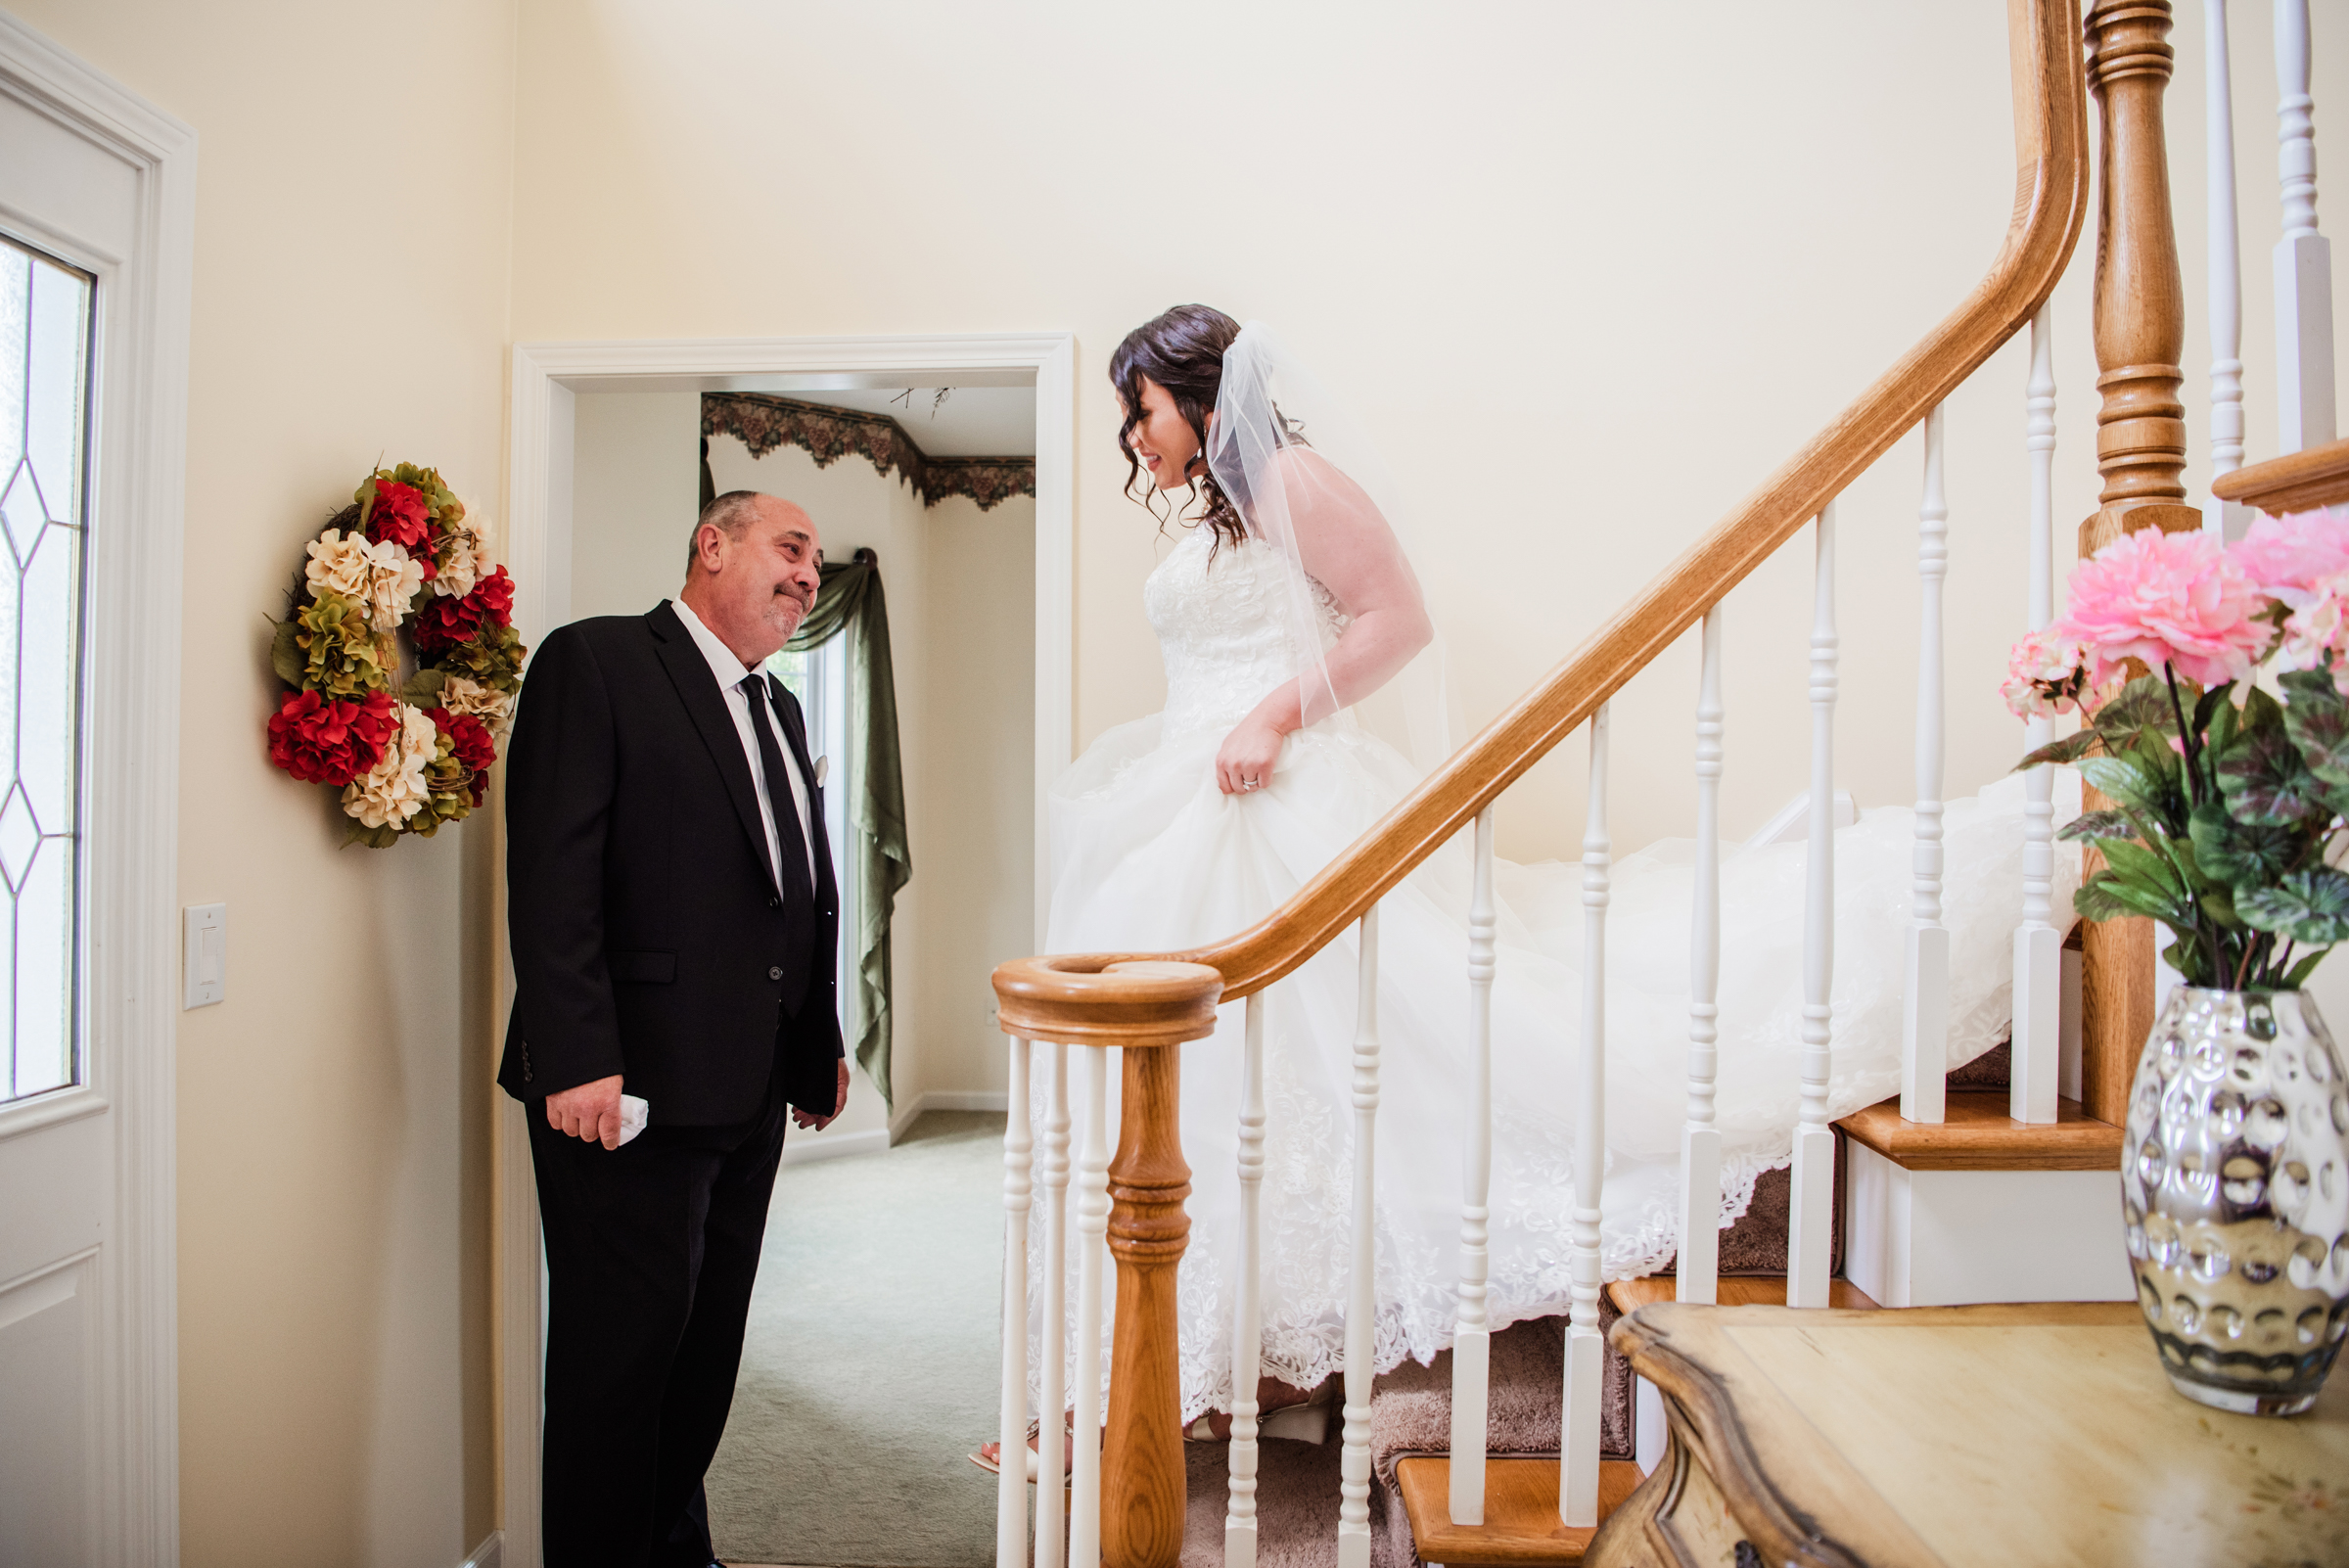 Historic_Old_St_Johns_Church_Valentinos_Banquet_Hall_Central_NY_Wedding_JILL_STUDIO_Rochester_NY_Photographer_DSC_5497.jpg